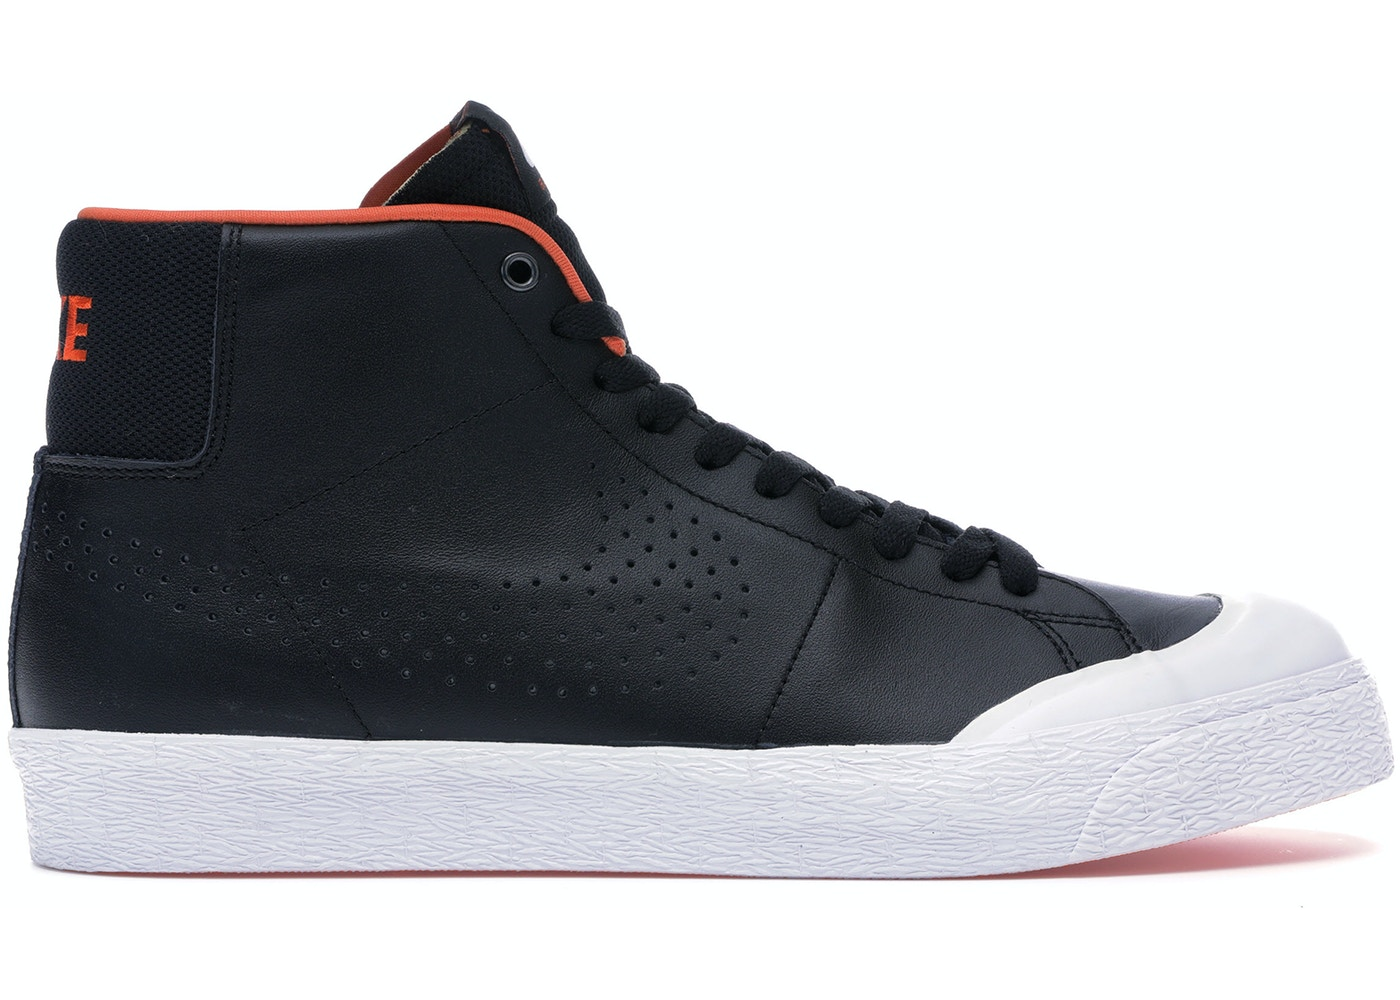 89ea67186e63 Nike SB Blazer Mid XT Donny Black - 876872-001